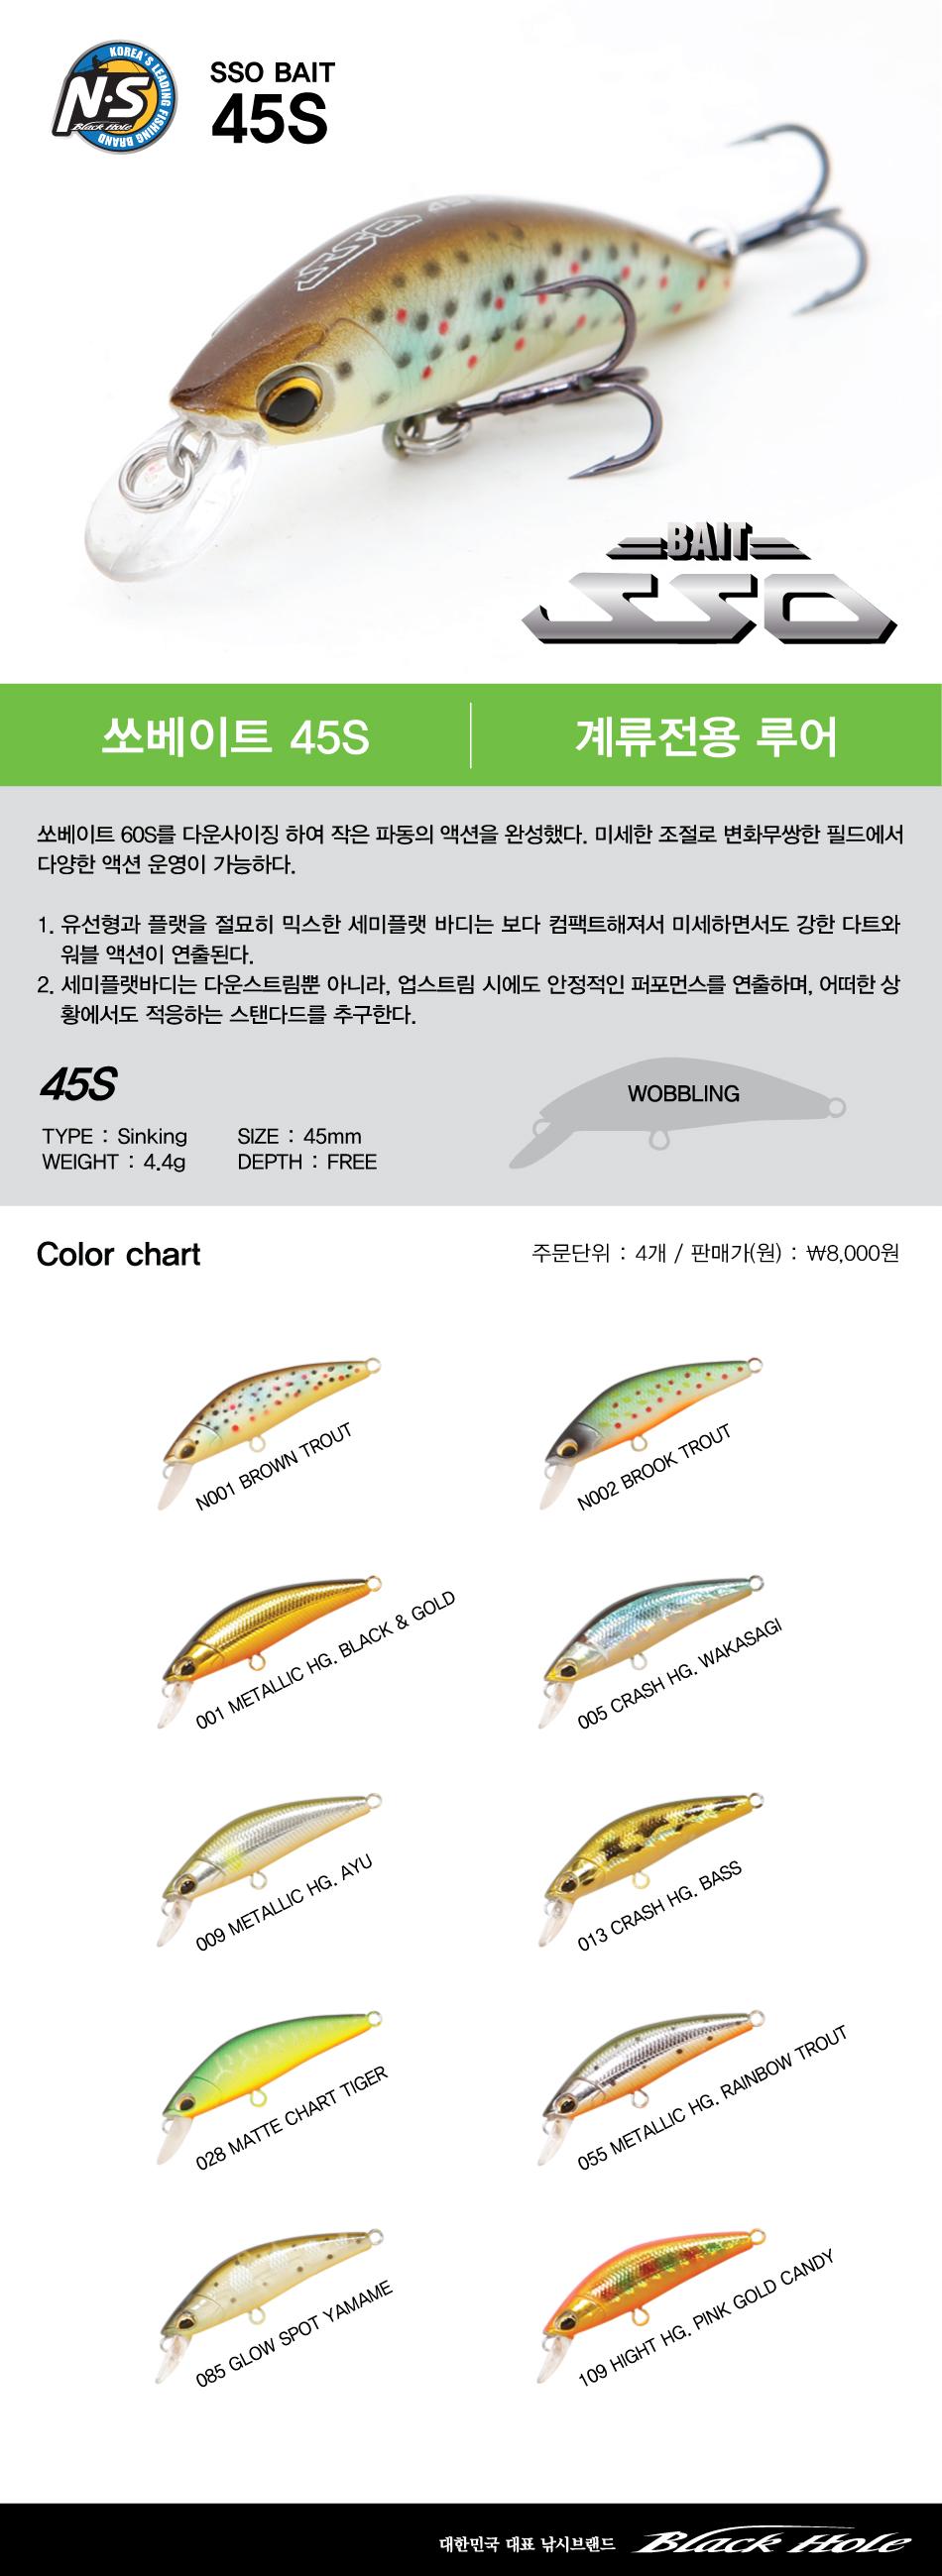 NS SSO BAIT 45S (쏘베이트) (계류전용) 싱킹타입 쏘베이트 계류 쏘가리 꺽지 강준치 민물루어 싱킹 SSOBAIT45S